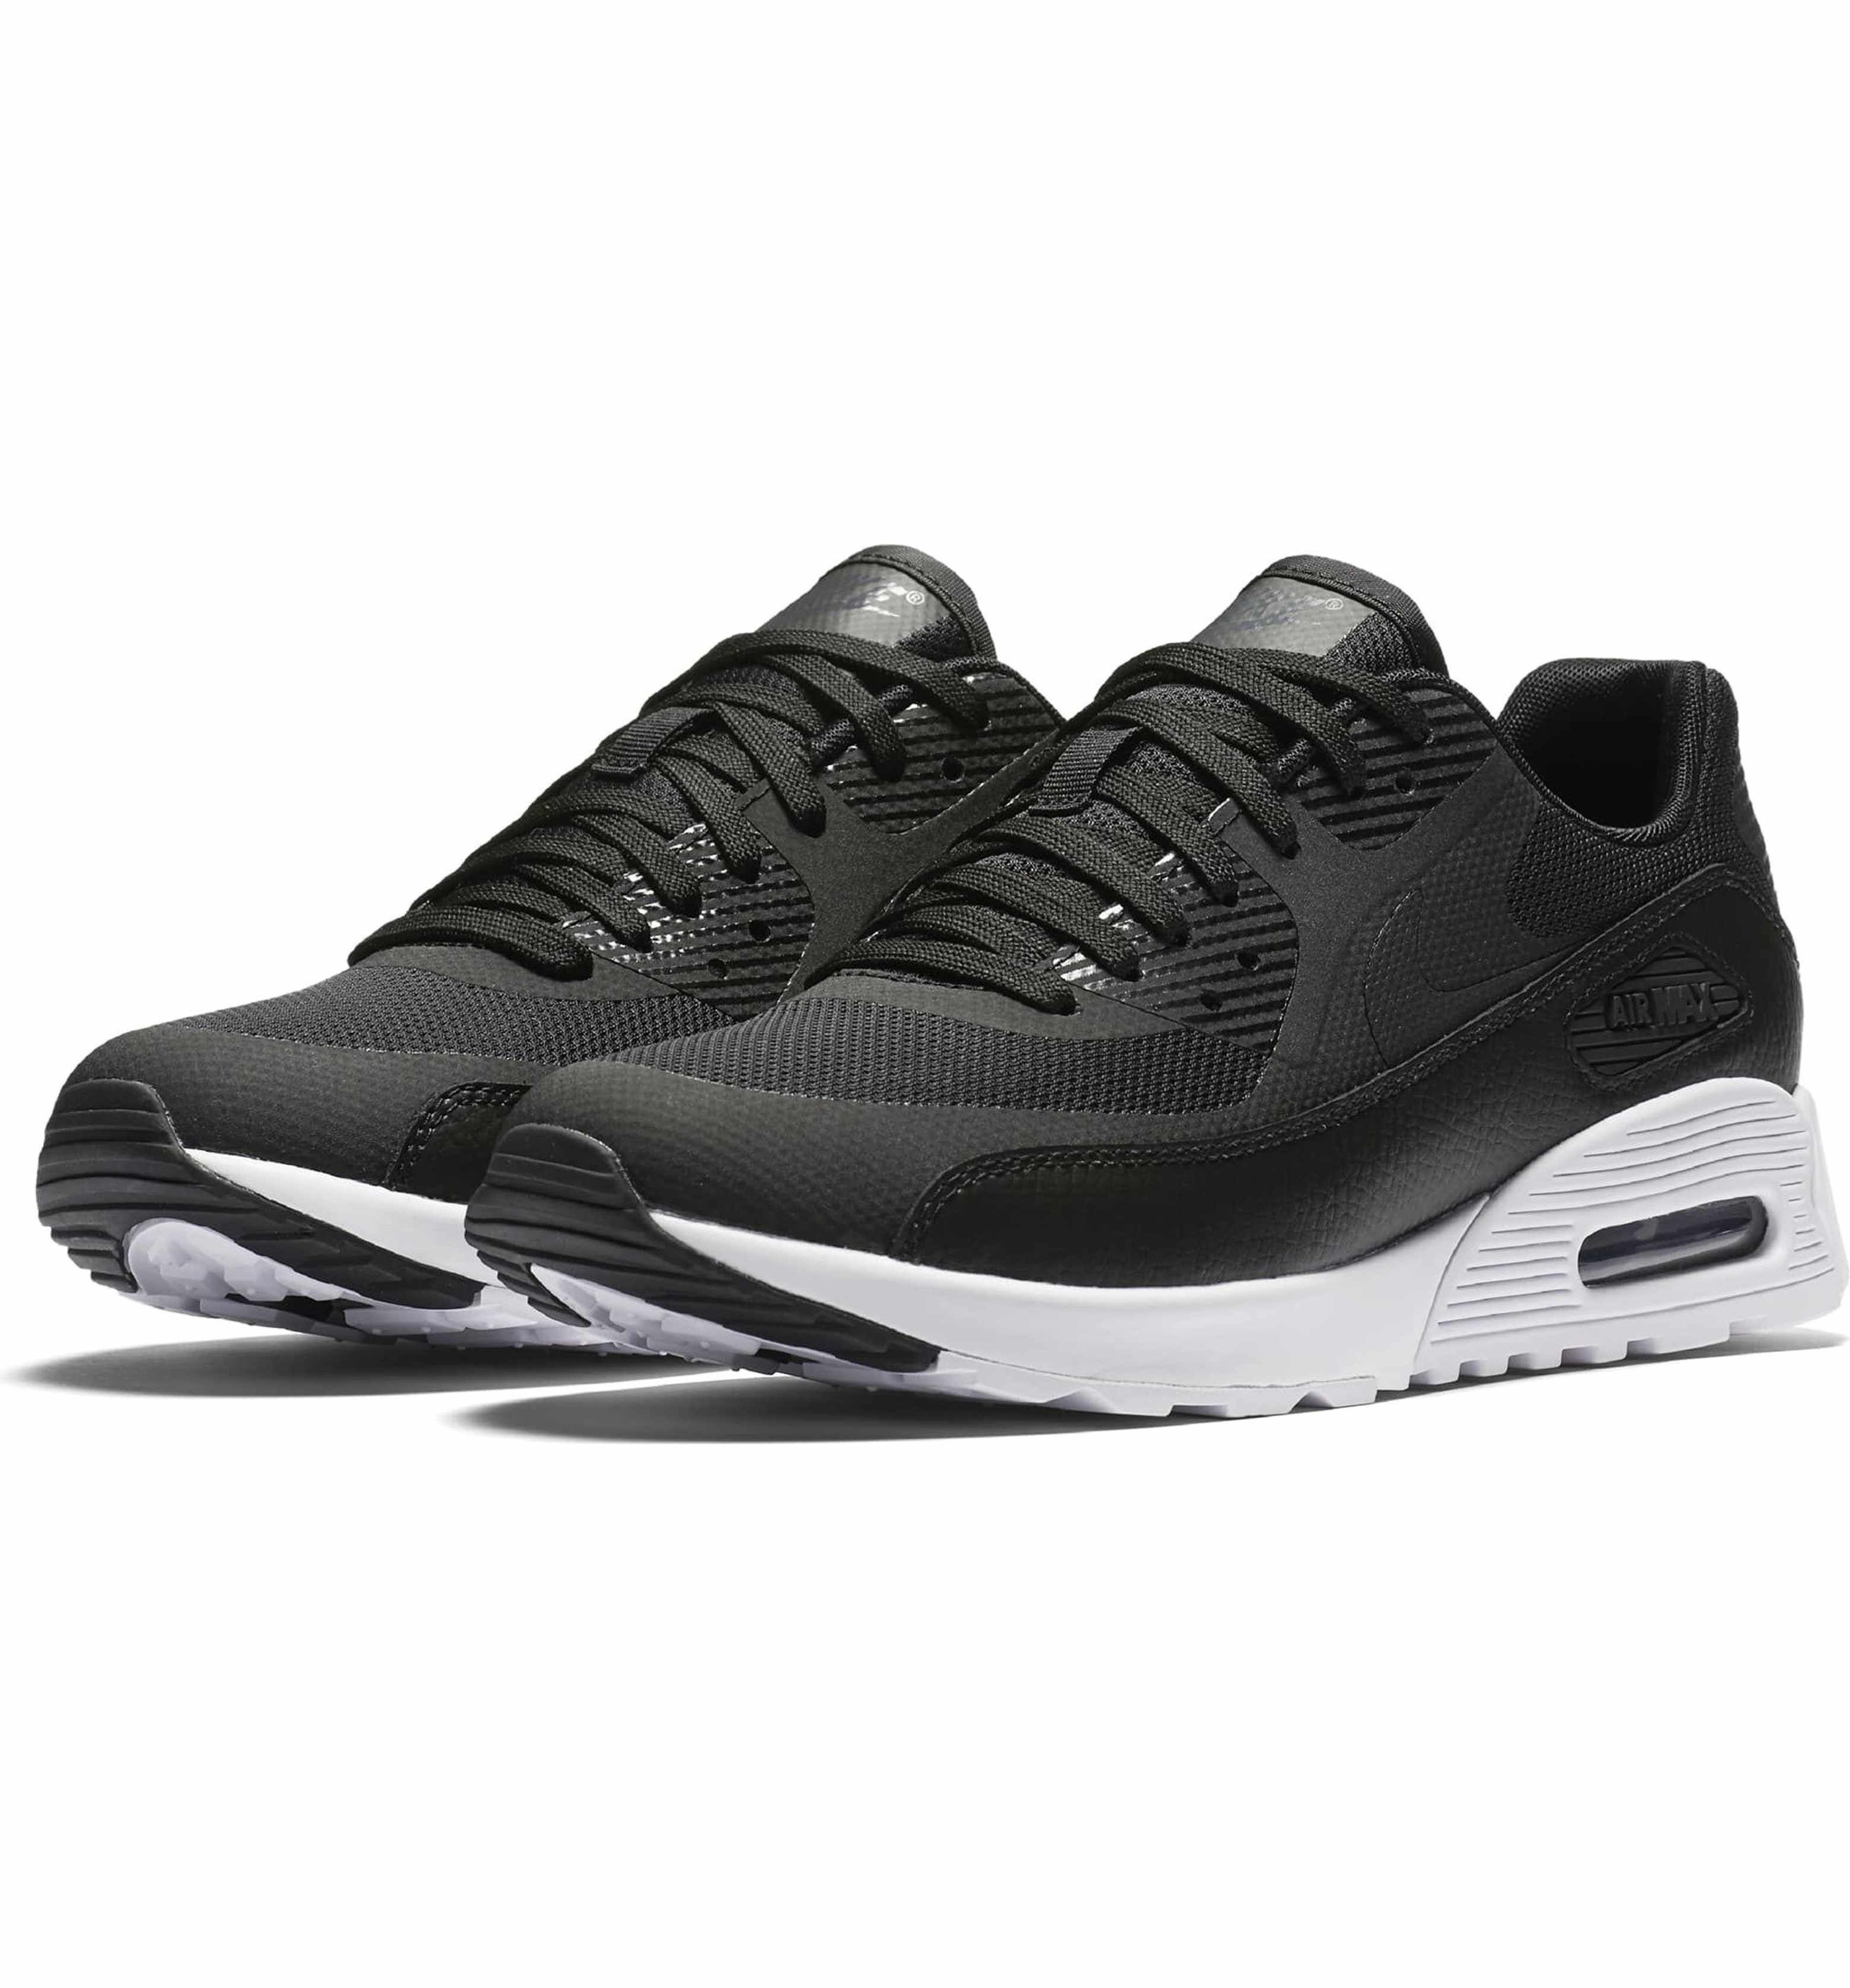 Main Image - Nike Air Max 90 Ultra 2.0 Sneaker (Women)  ec0d15c722